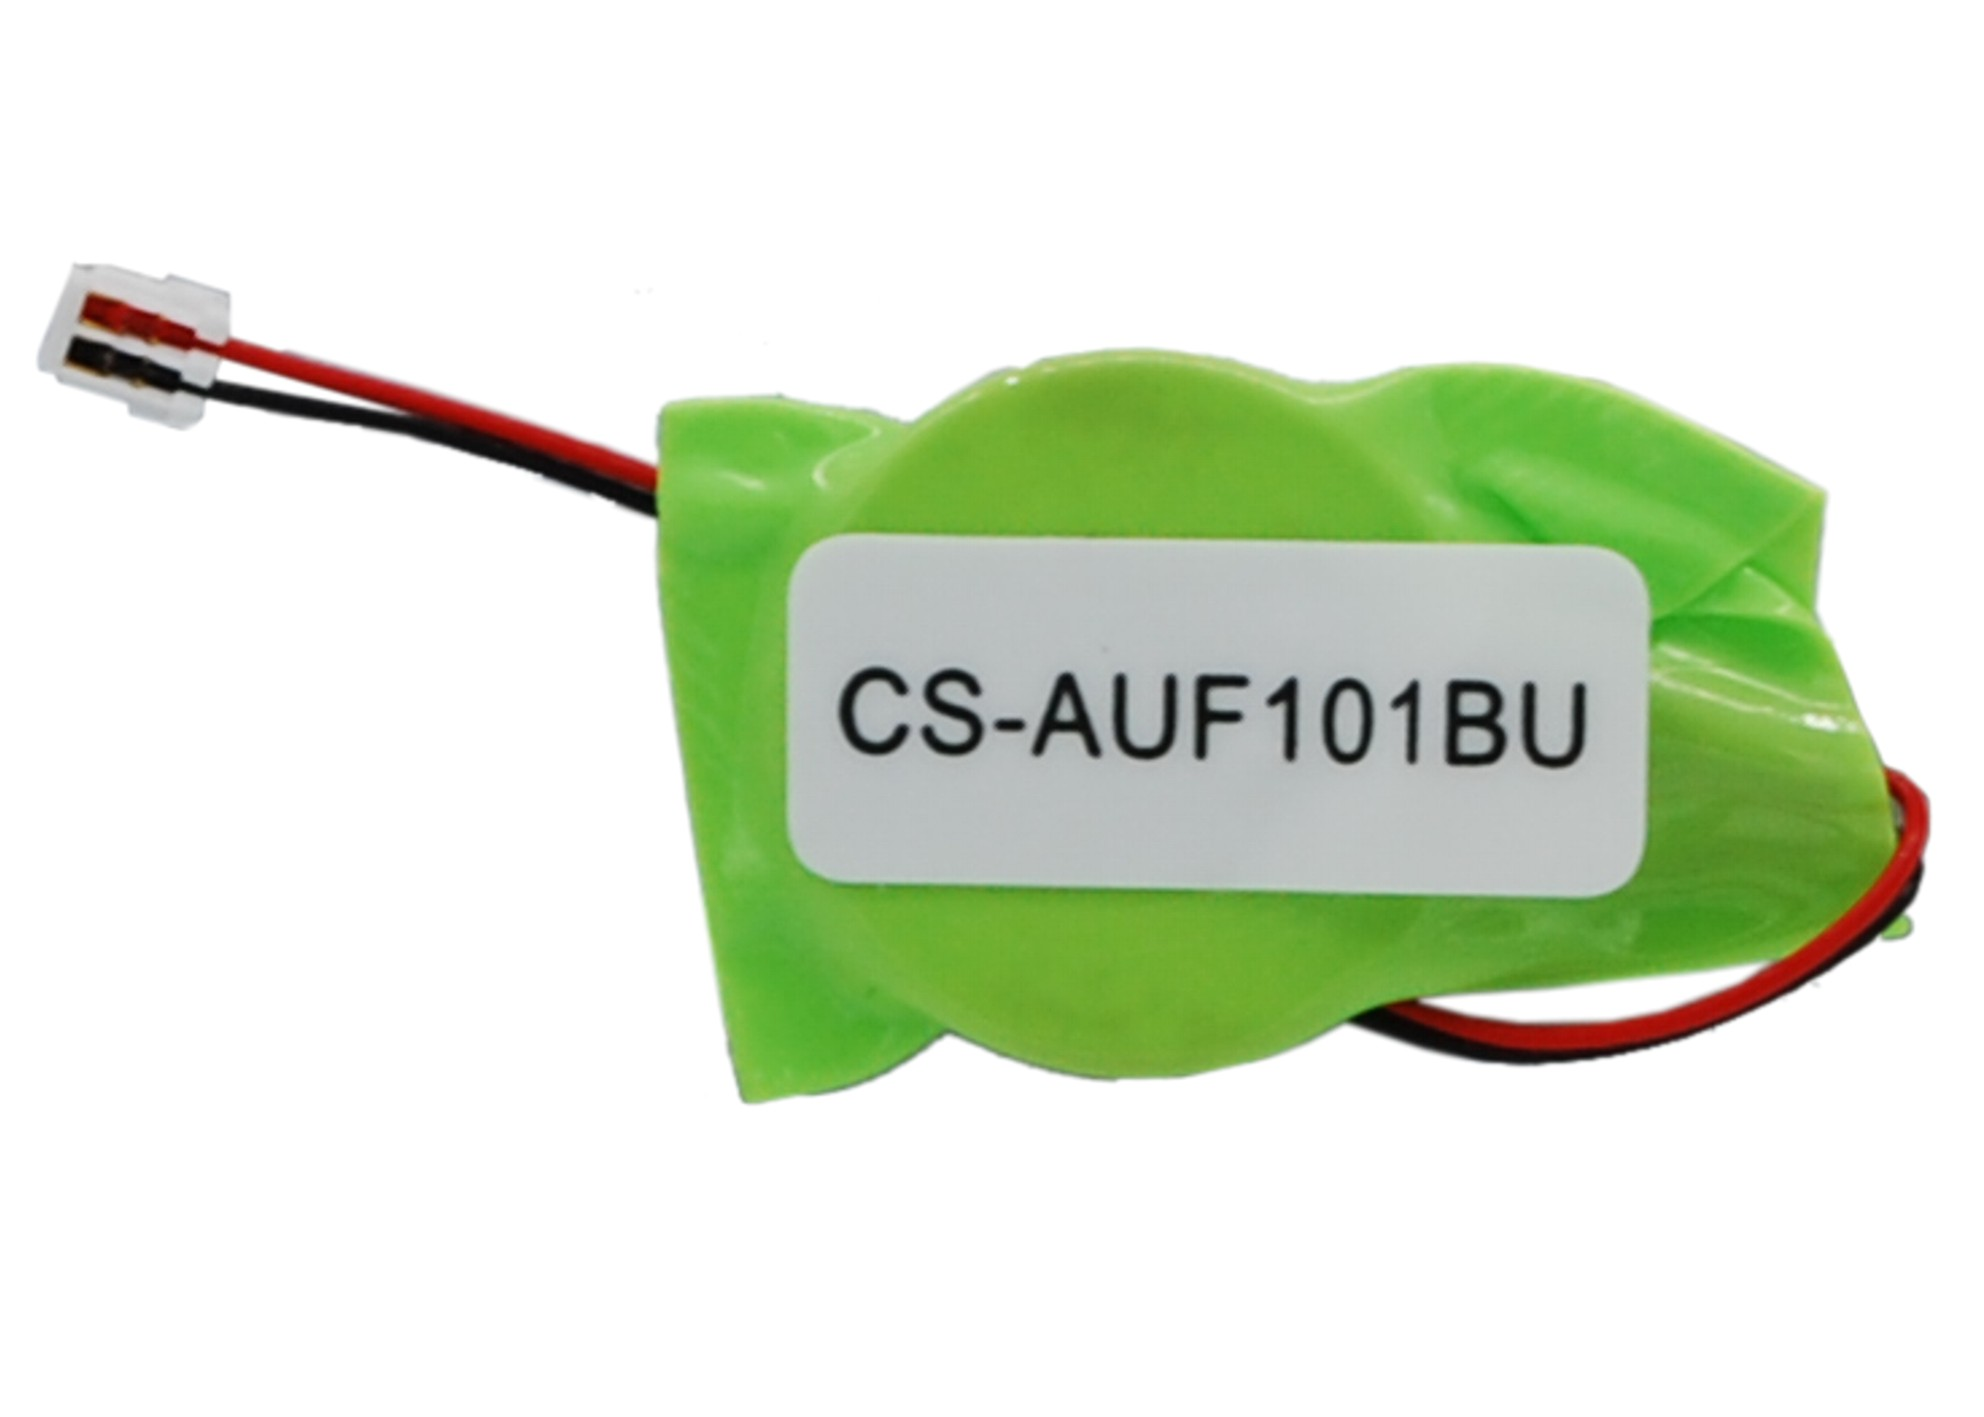 Cameron Sino baterie cmos pro ASUS Eee Pad Transformer TF101-1B179A 3V Li-ion 40mAh zelená - neoriginální